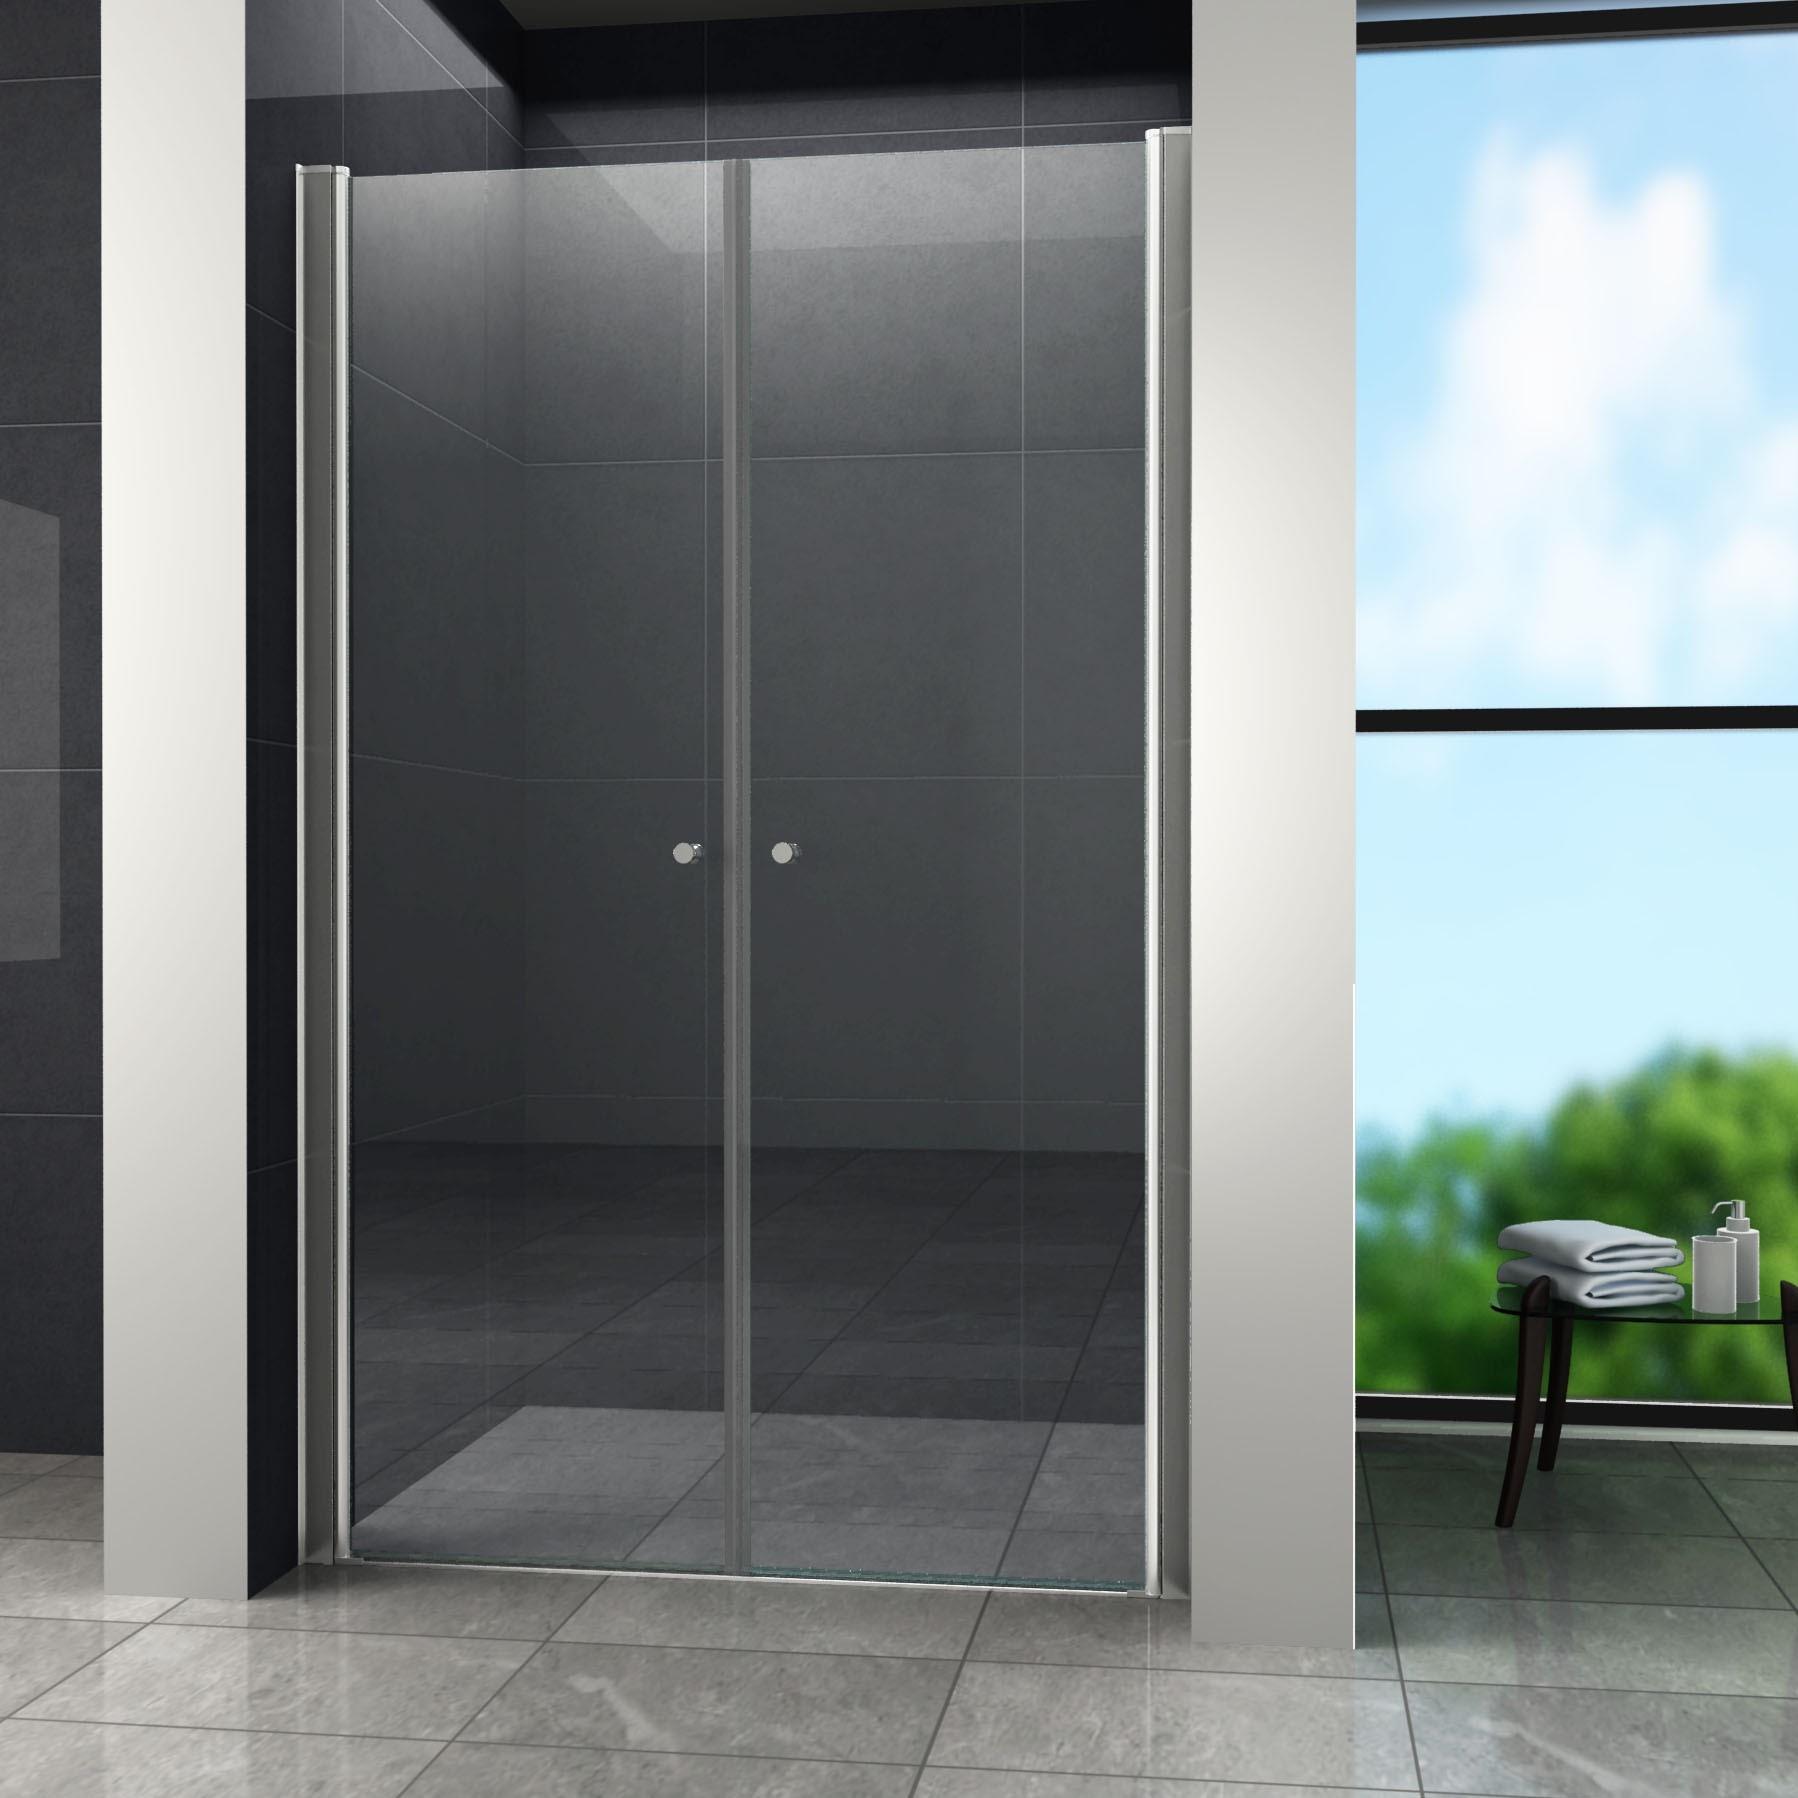 Swing Douchedeur Pendeldeur 75x180 cm Helder Glas binnen 2 tot 4 werkdagen in huis met voordeel